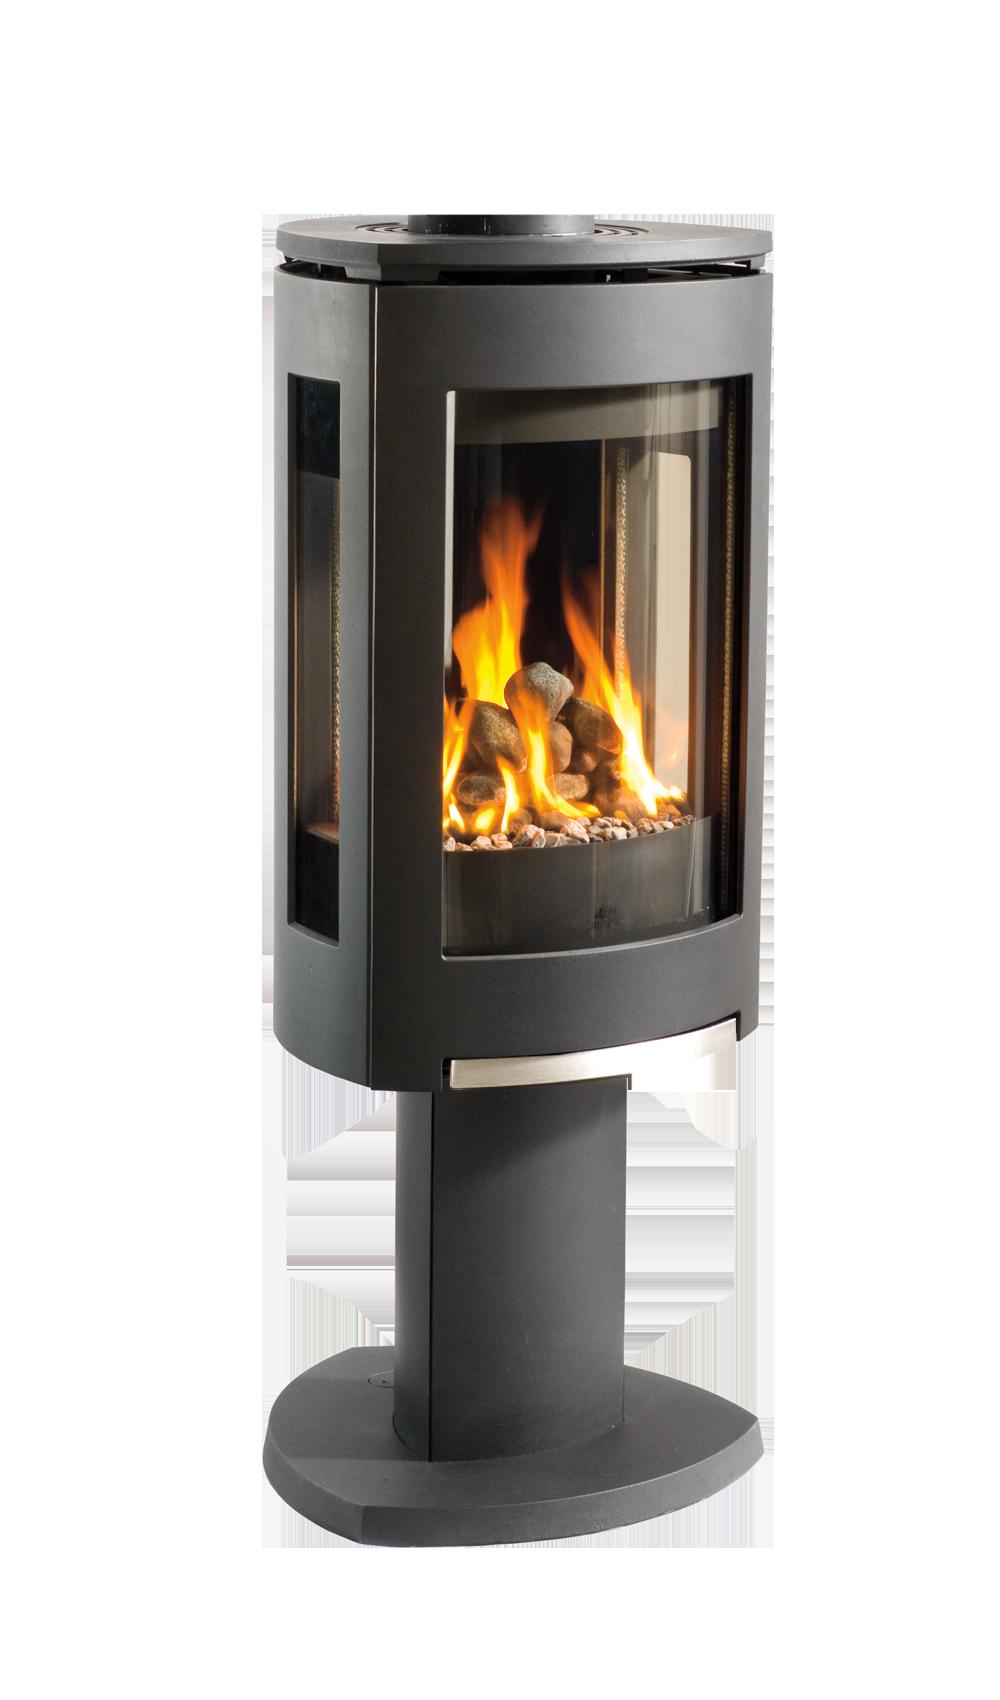 Jøtul Gf 370 Dv Modern Free Standing Gas Fireplace